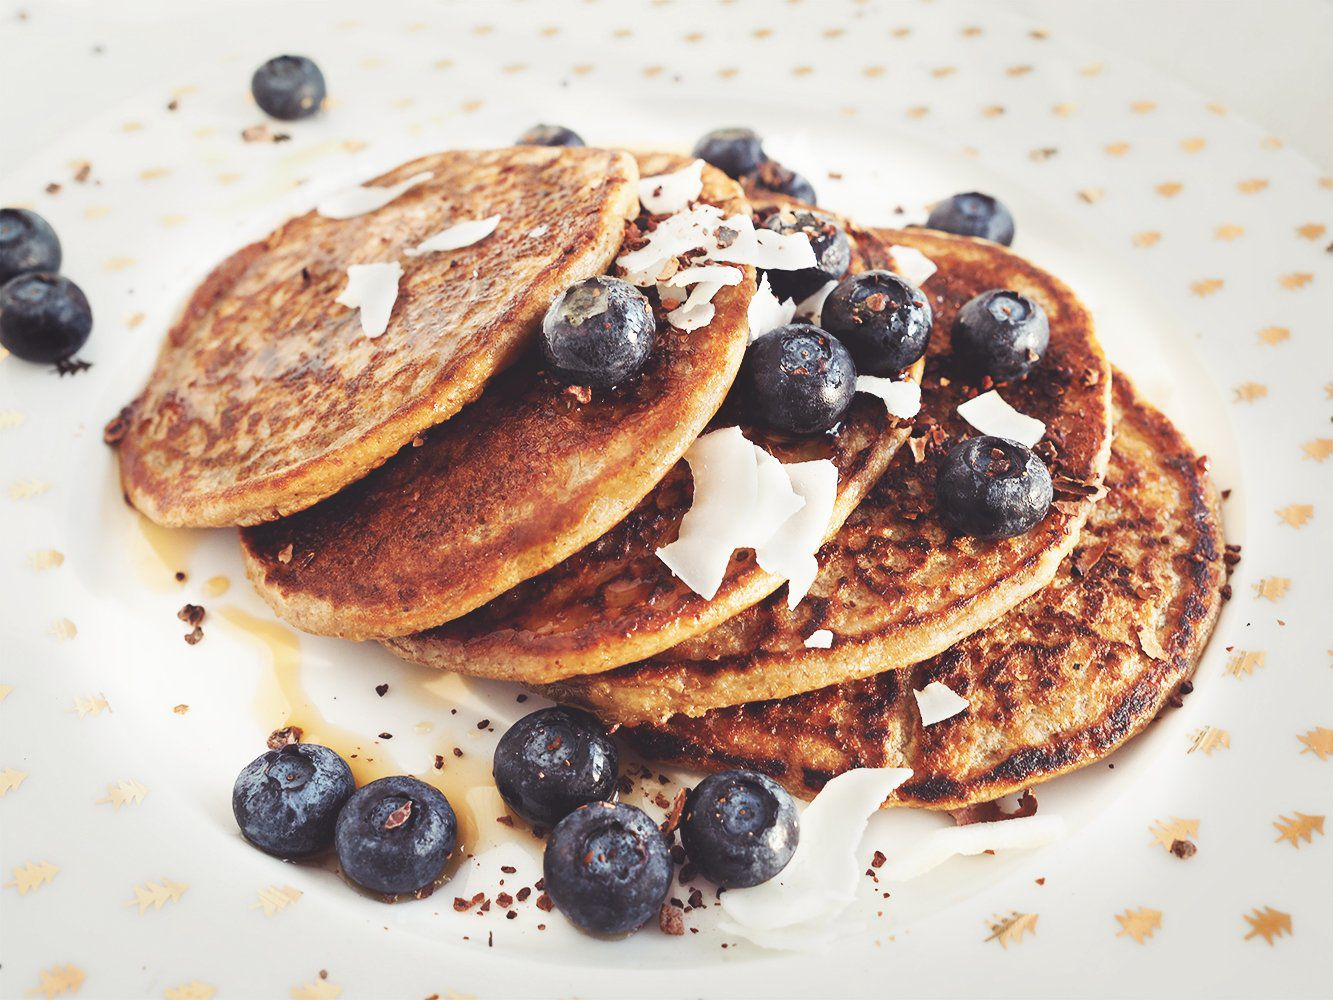 Placki bananowe (pancakes)